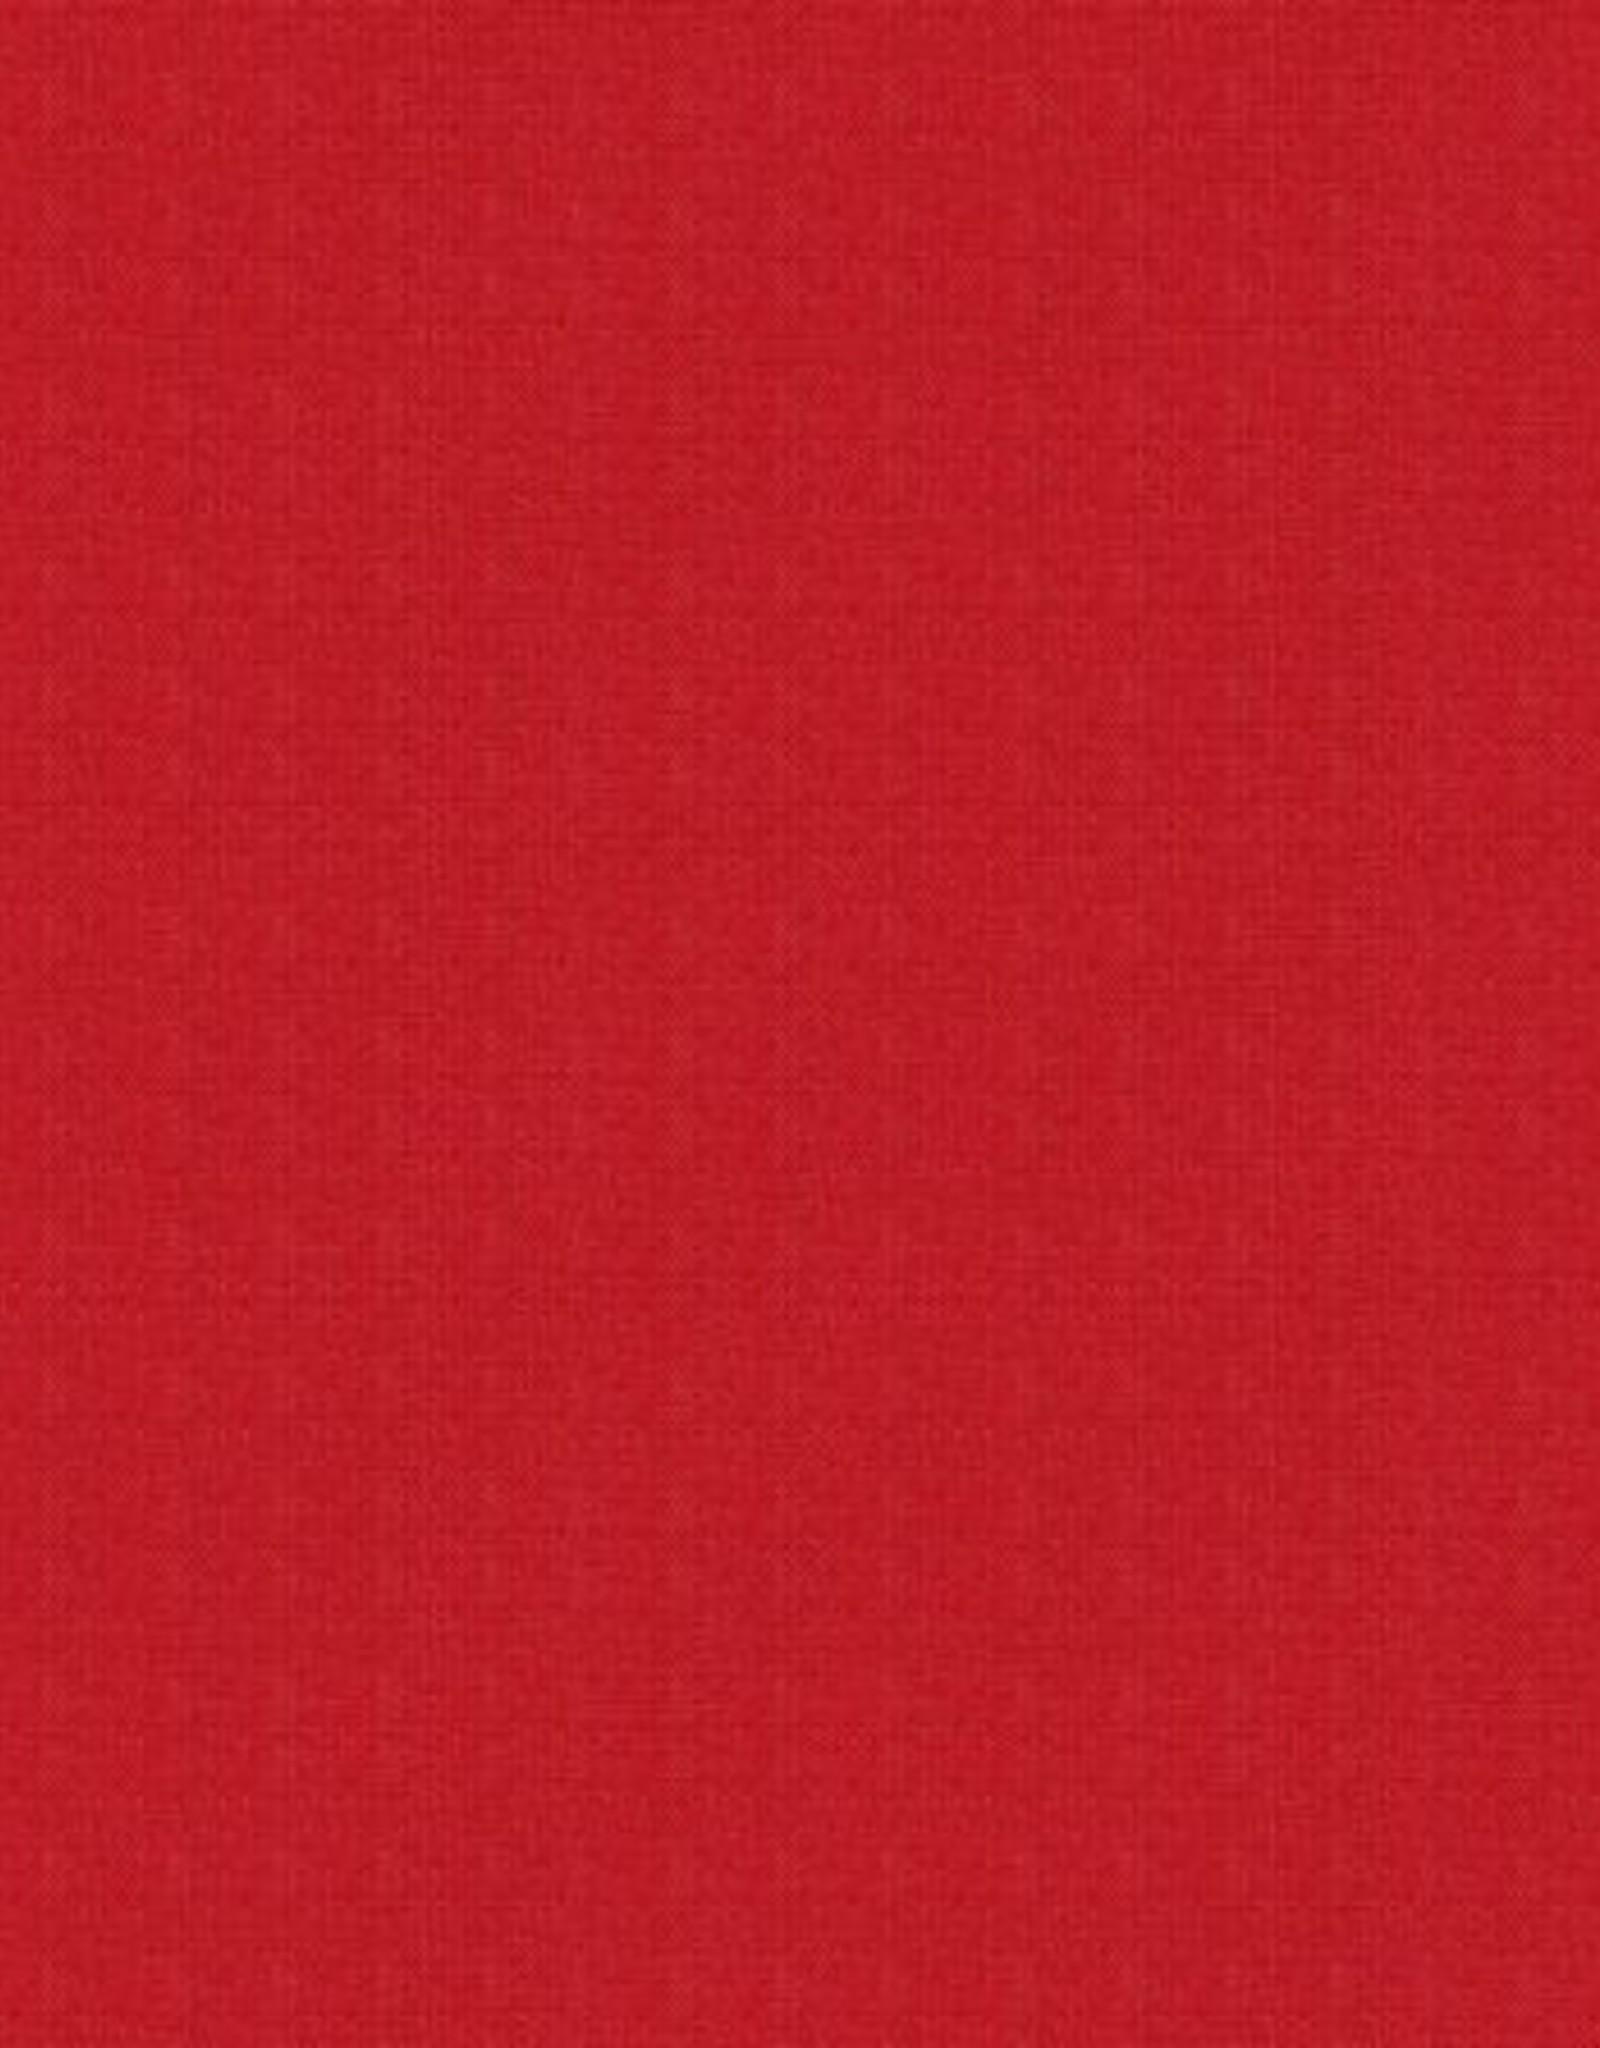 Westfalenstoffe AG 10 cm Uni rot W4004950